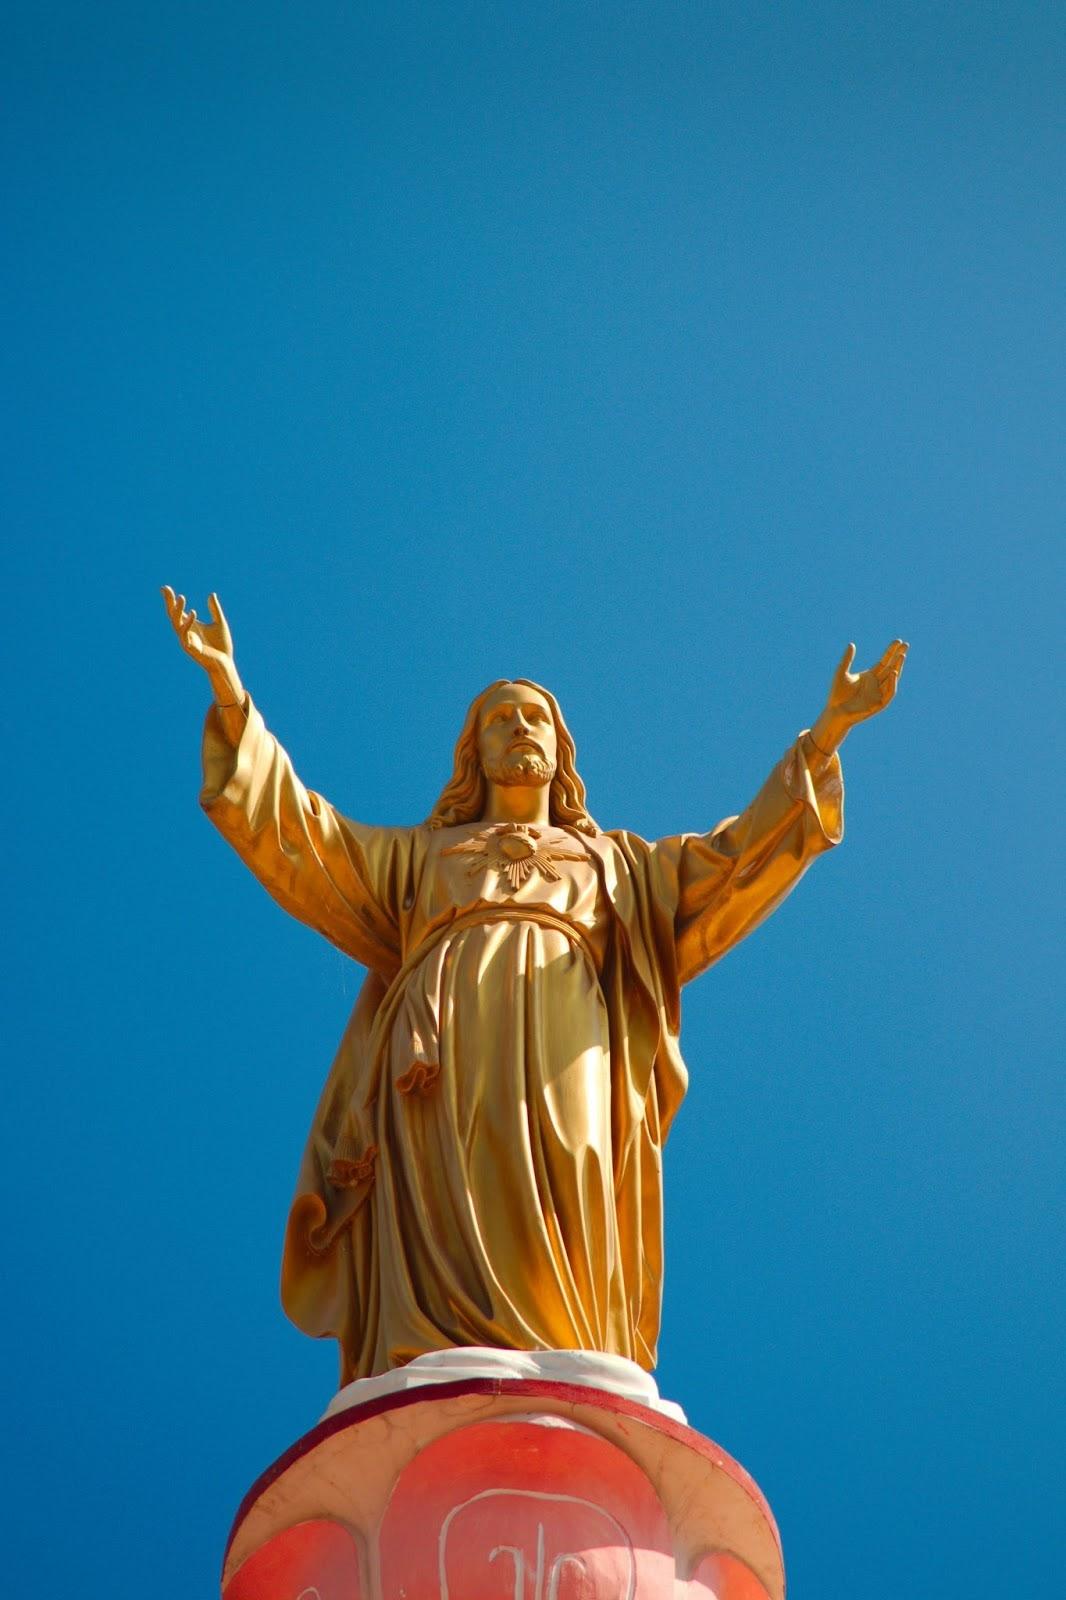 gold statue of Jesus